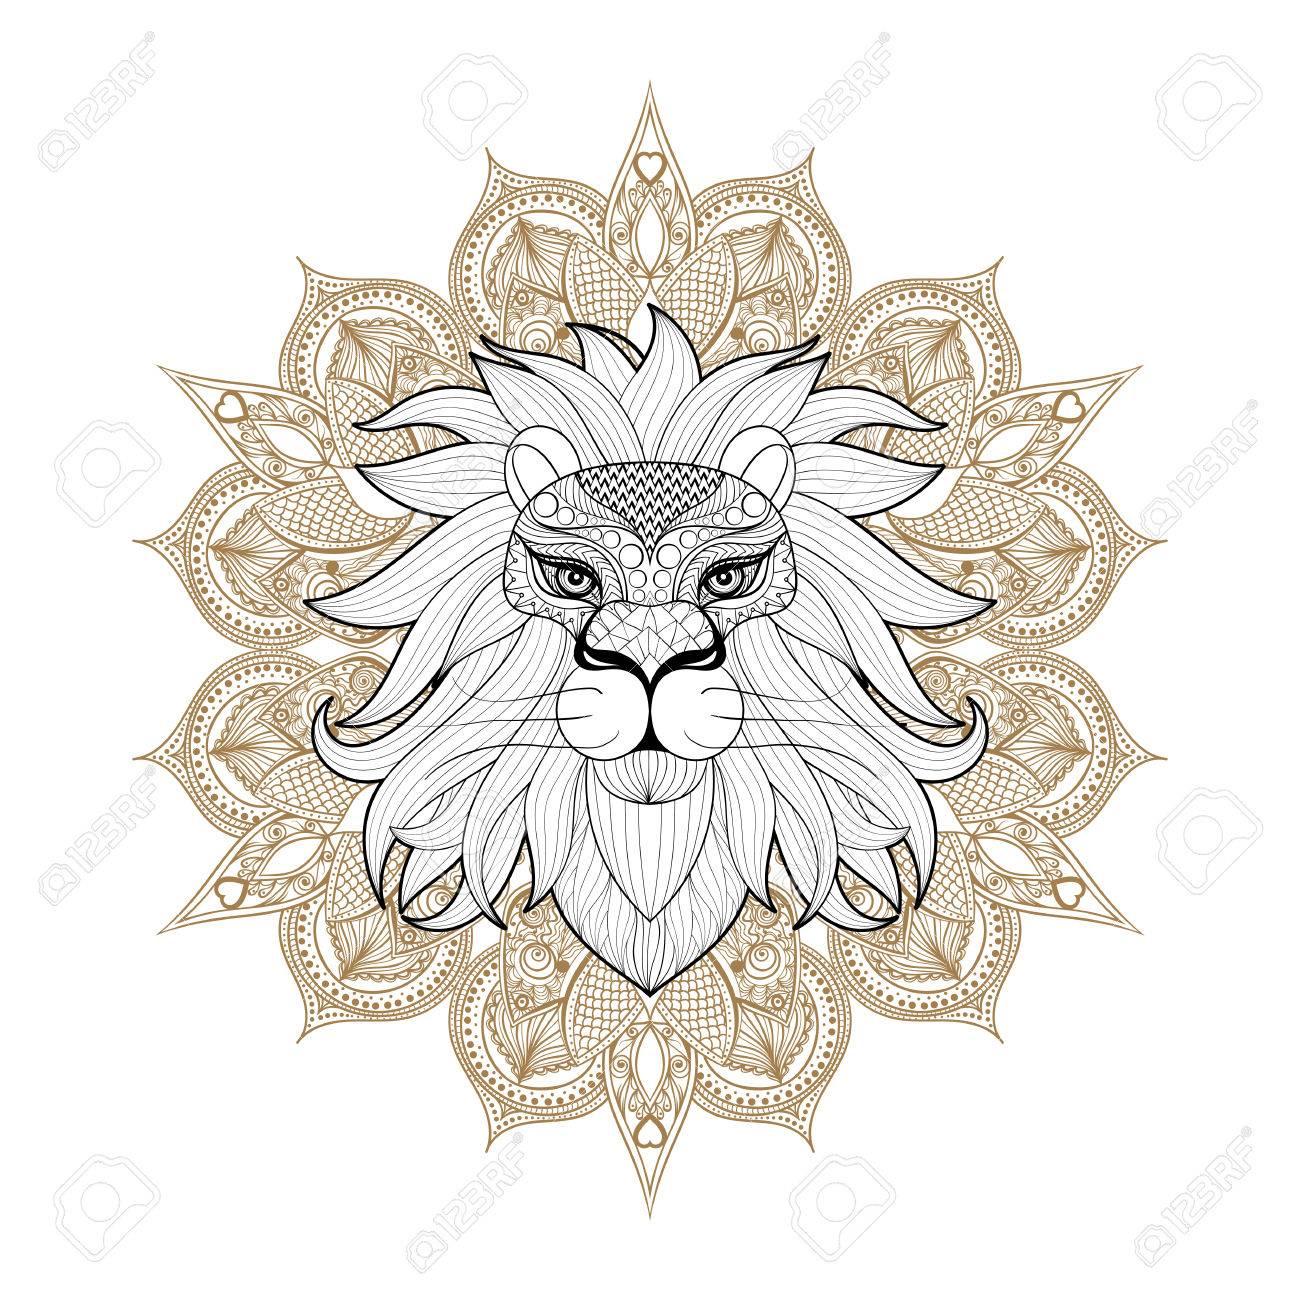 Dibujado A Mano Ornamental León En Mandala Mehendi Para Colorear ...